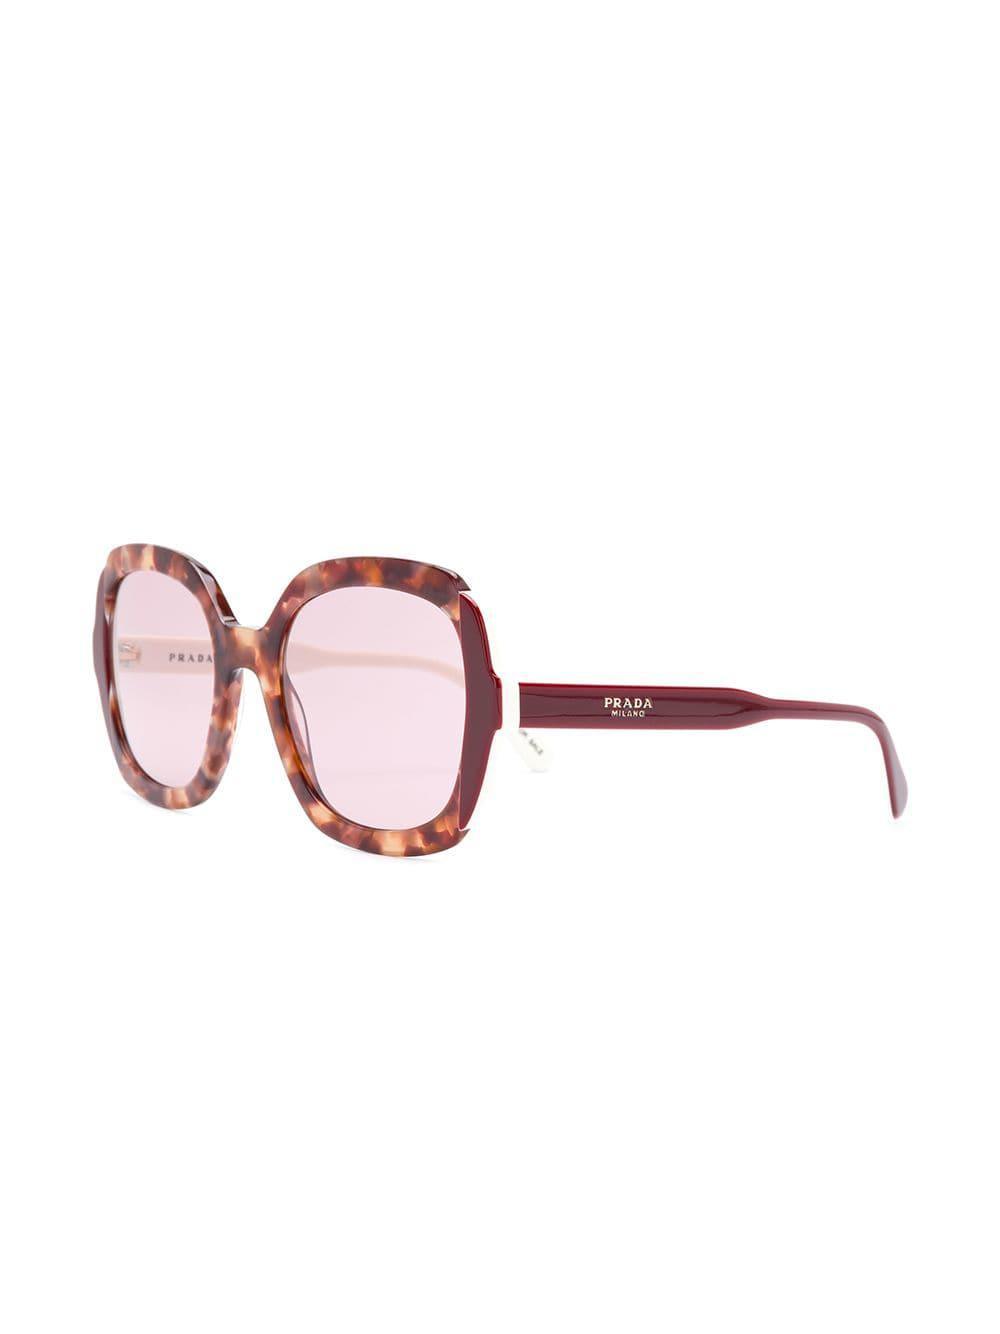 5fc667fa9cd Prada - Red Oversized Square-frame Sunglassesc - Lyst. View fullscreen